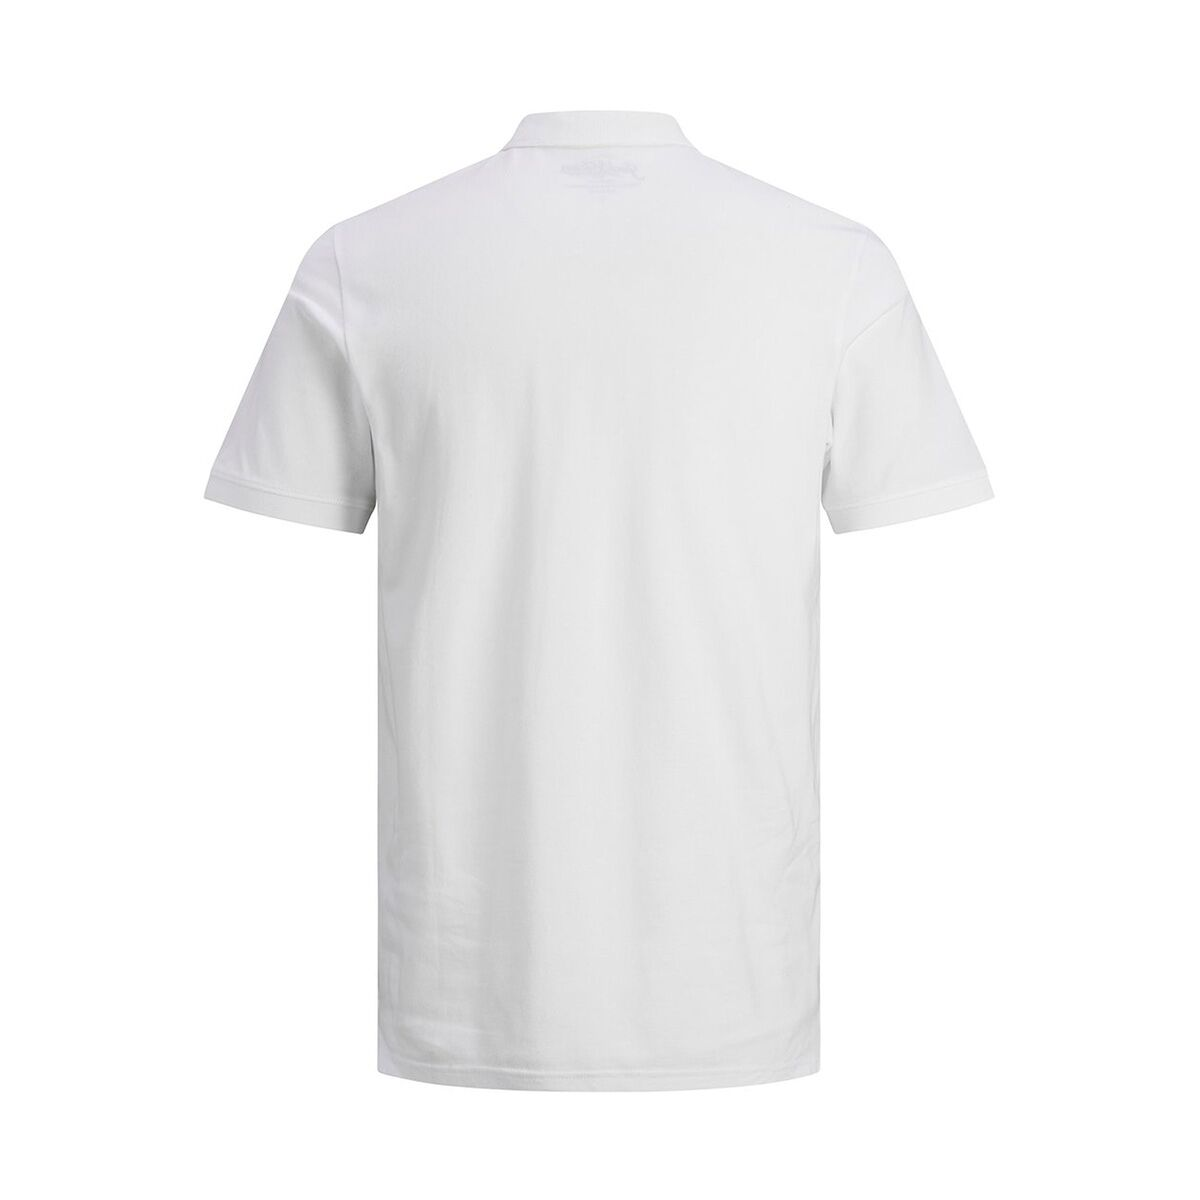 jjebasic polo ss noos 12136516 jack & jones polo white/slim fit